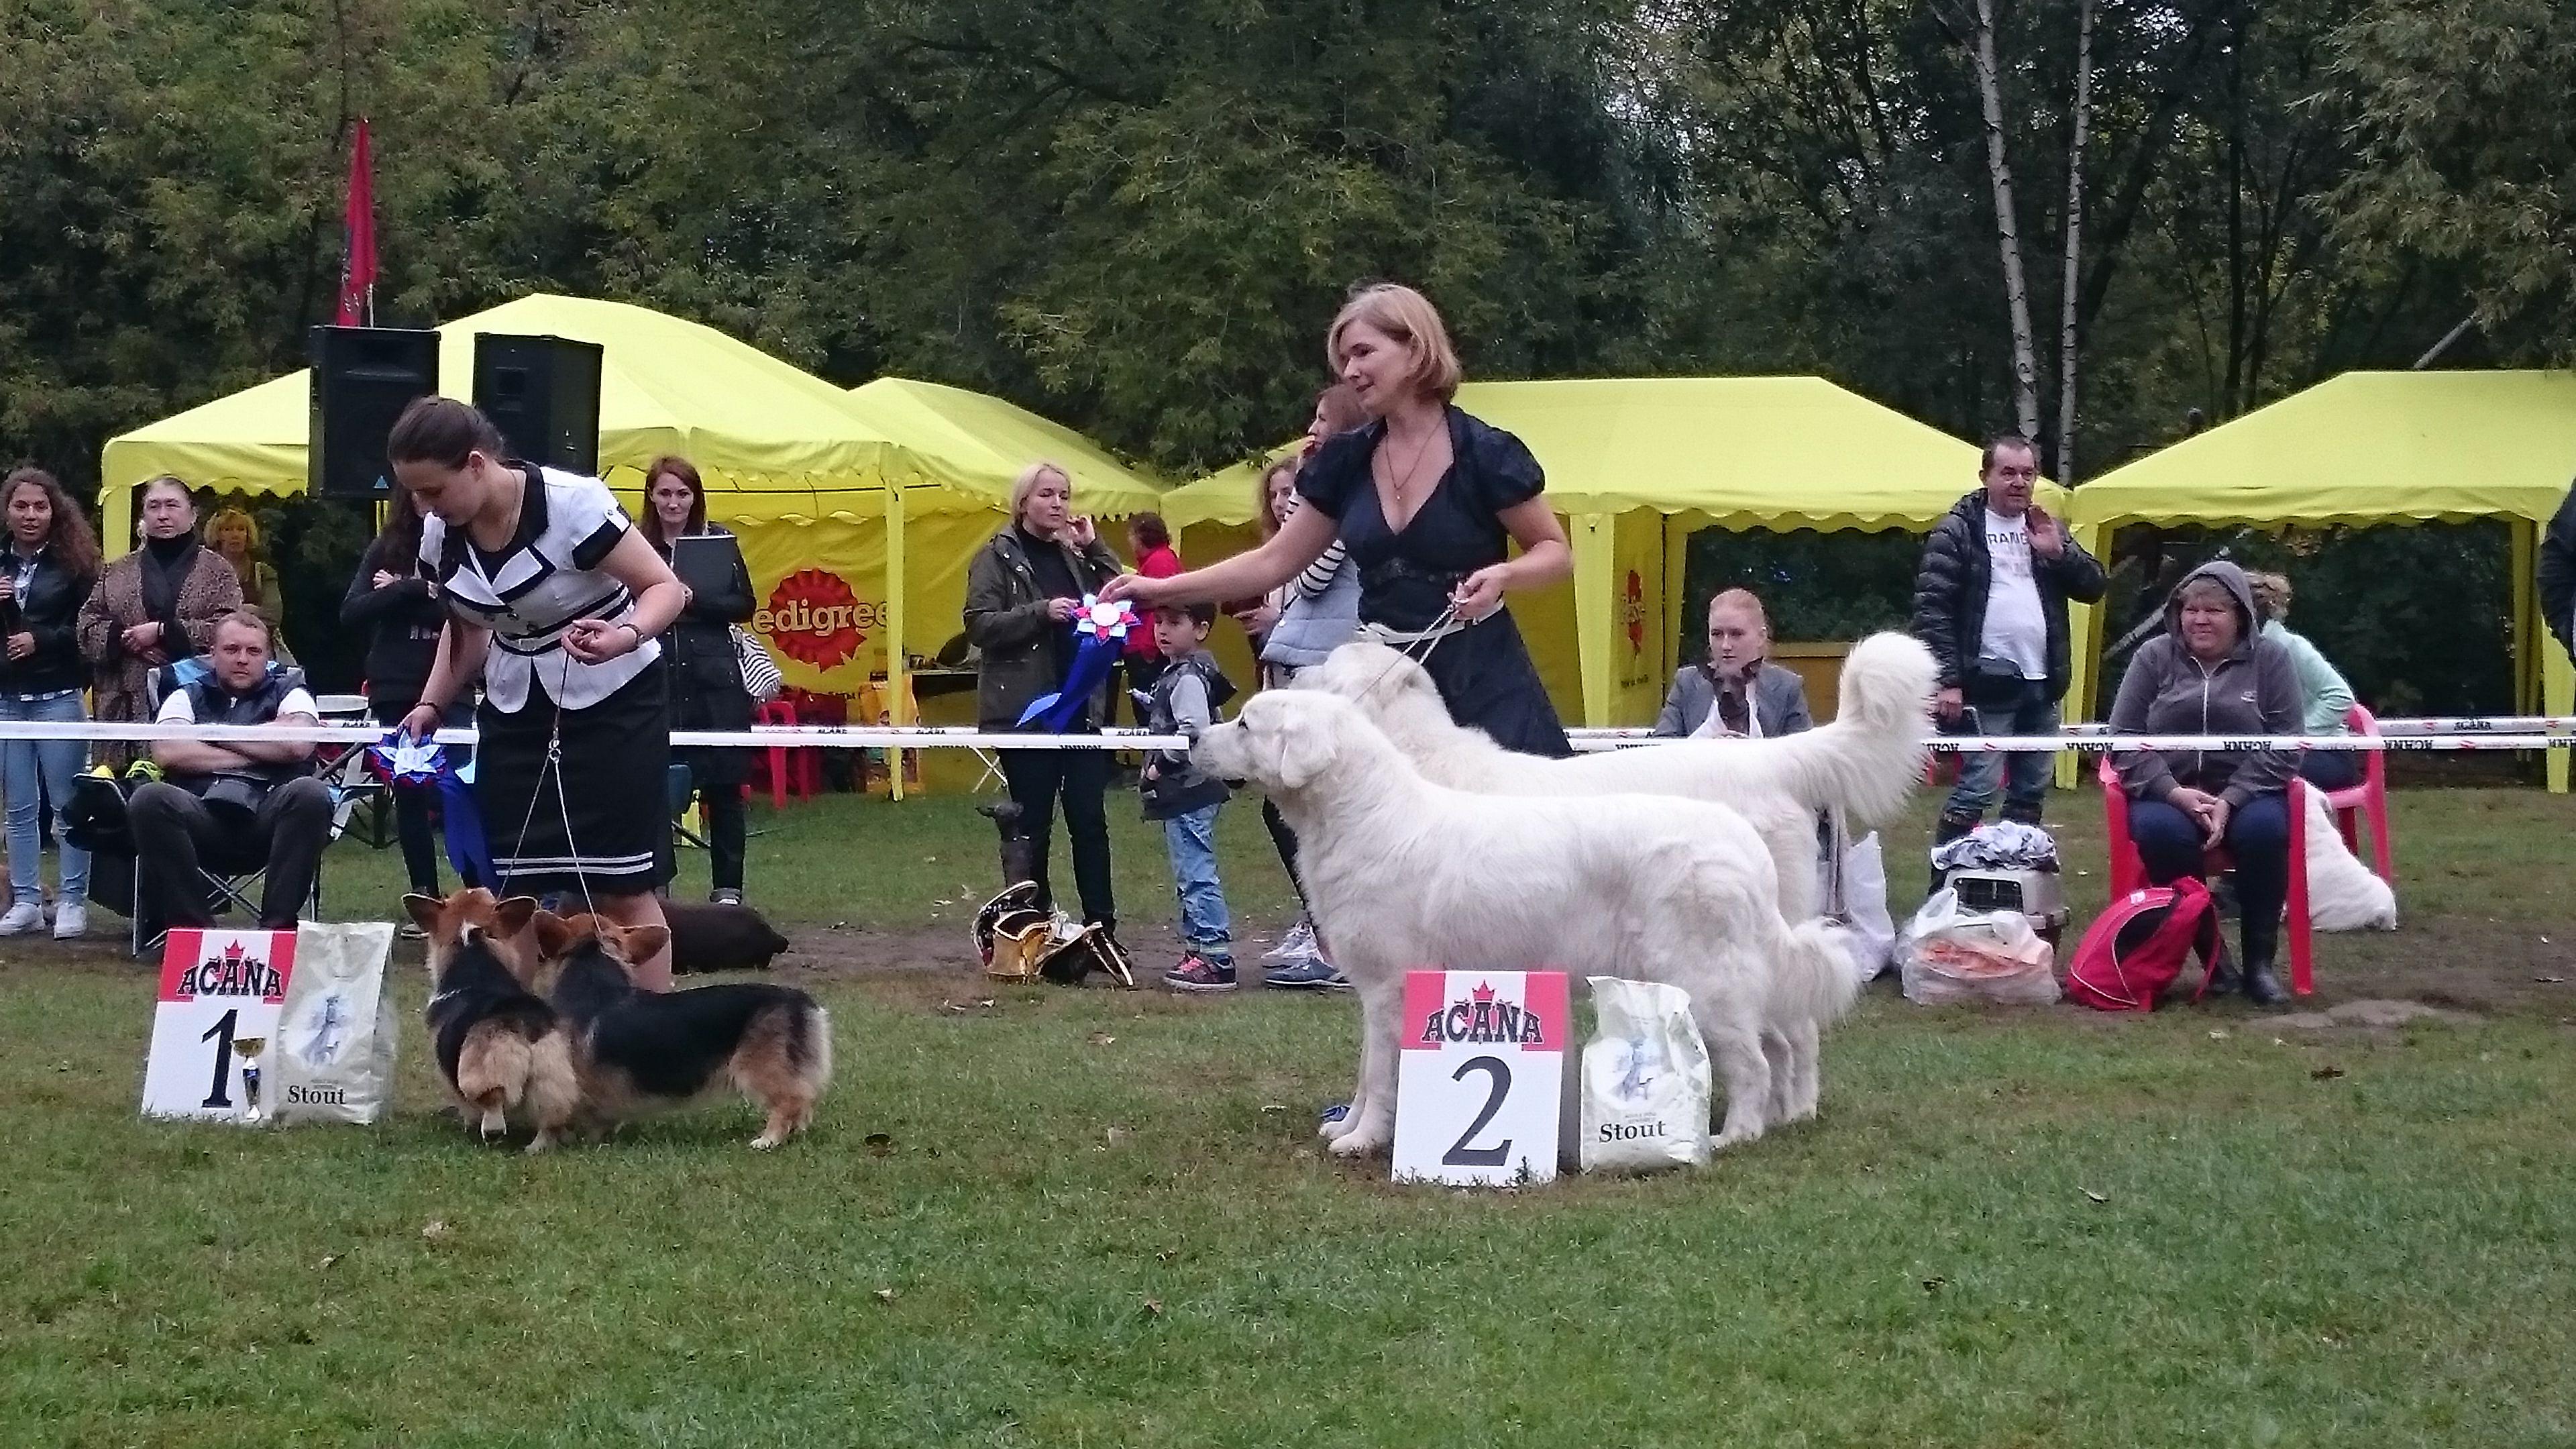 Zuzzu and Tsar. DogShow Antares.